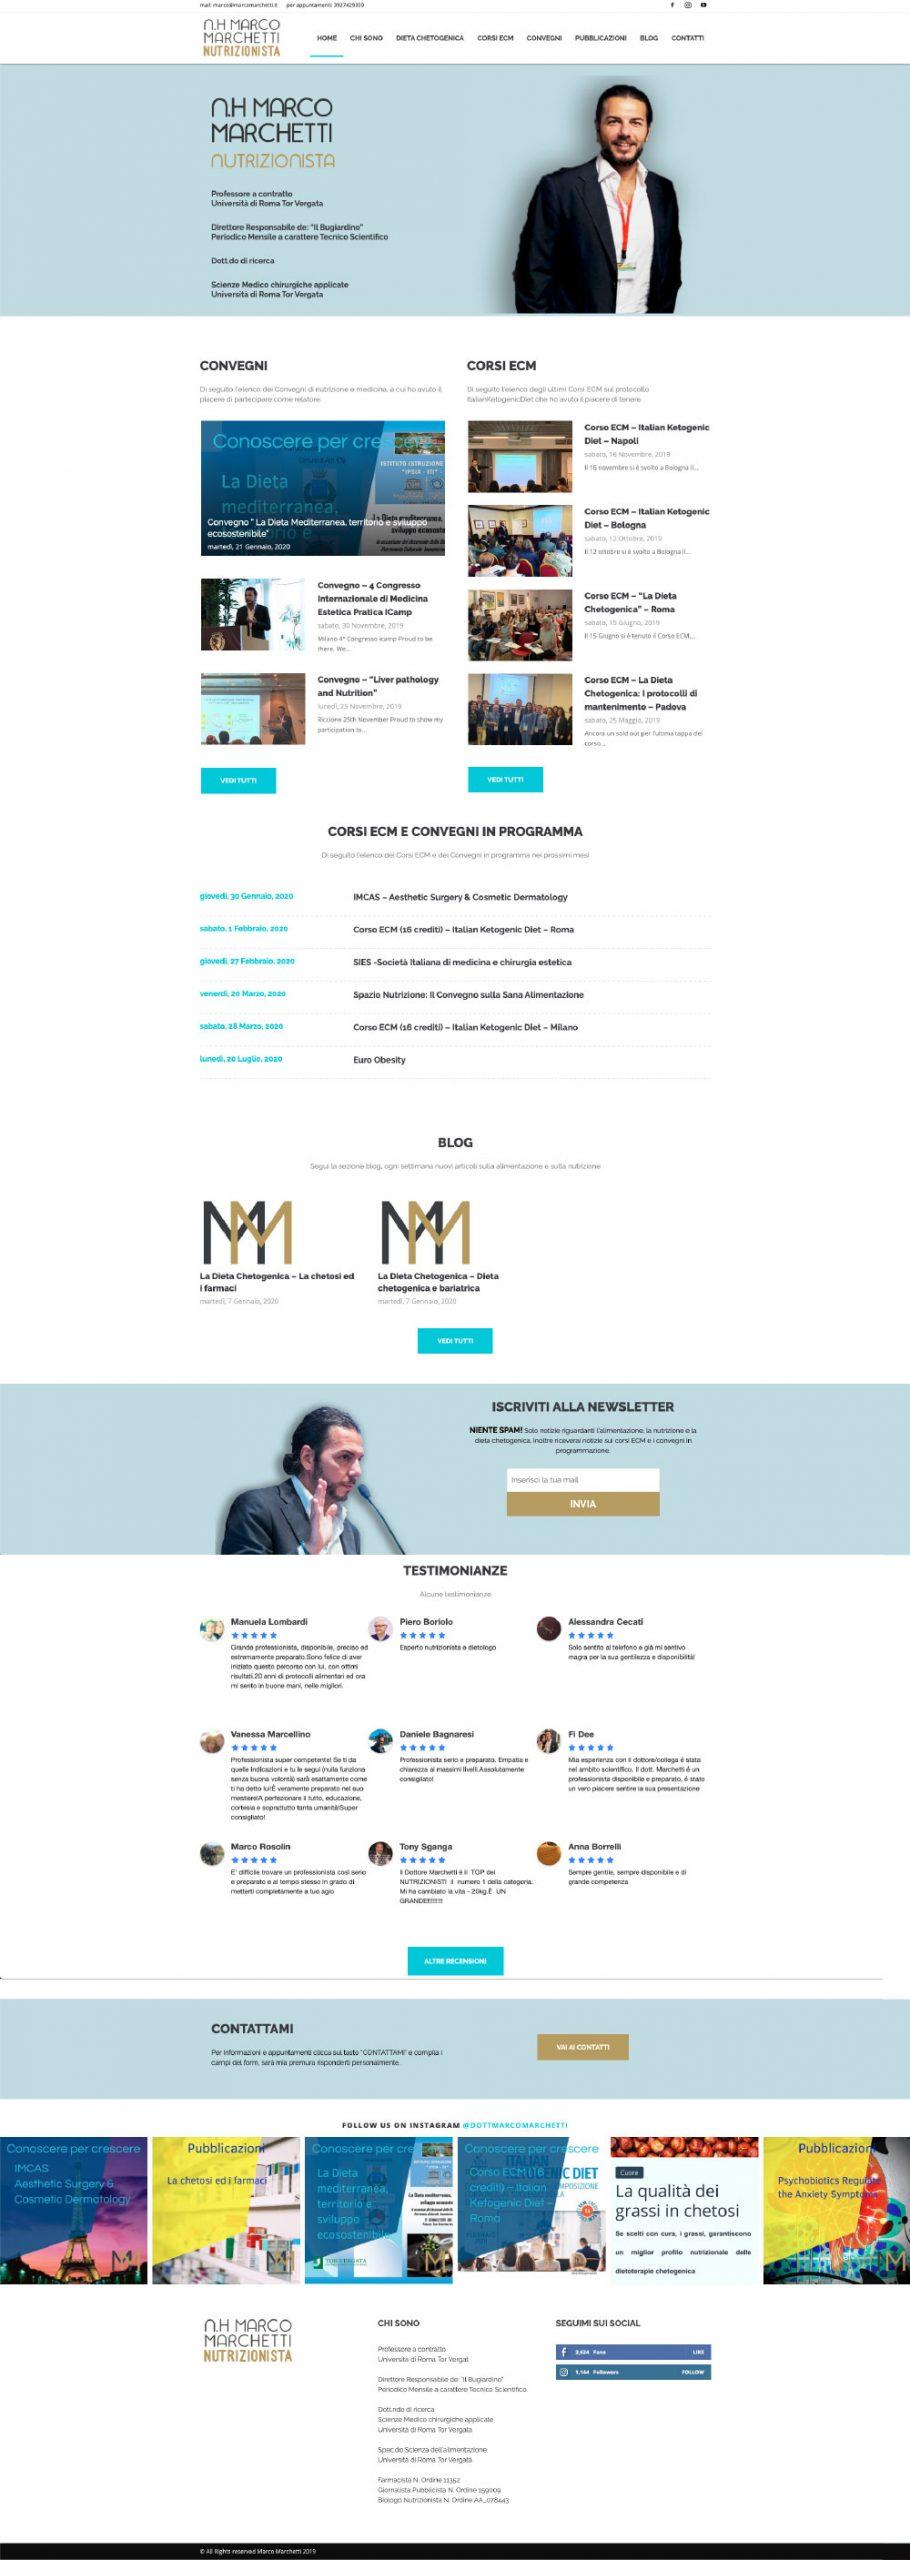 N.H. Marco Marchetti Nutrizionista website layout